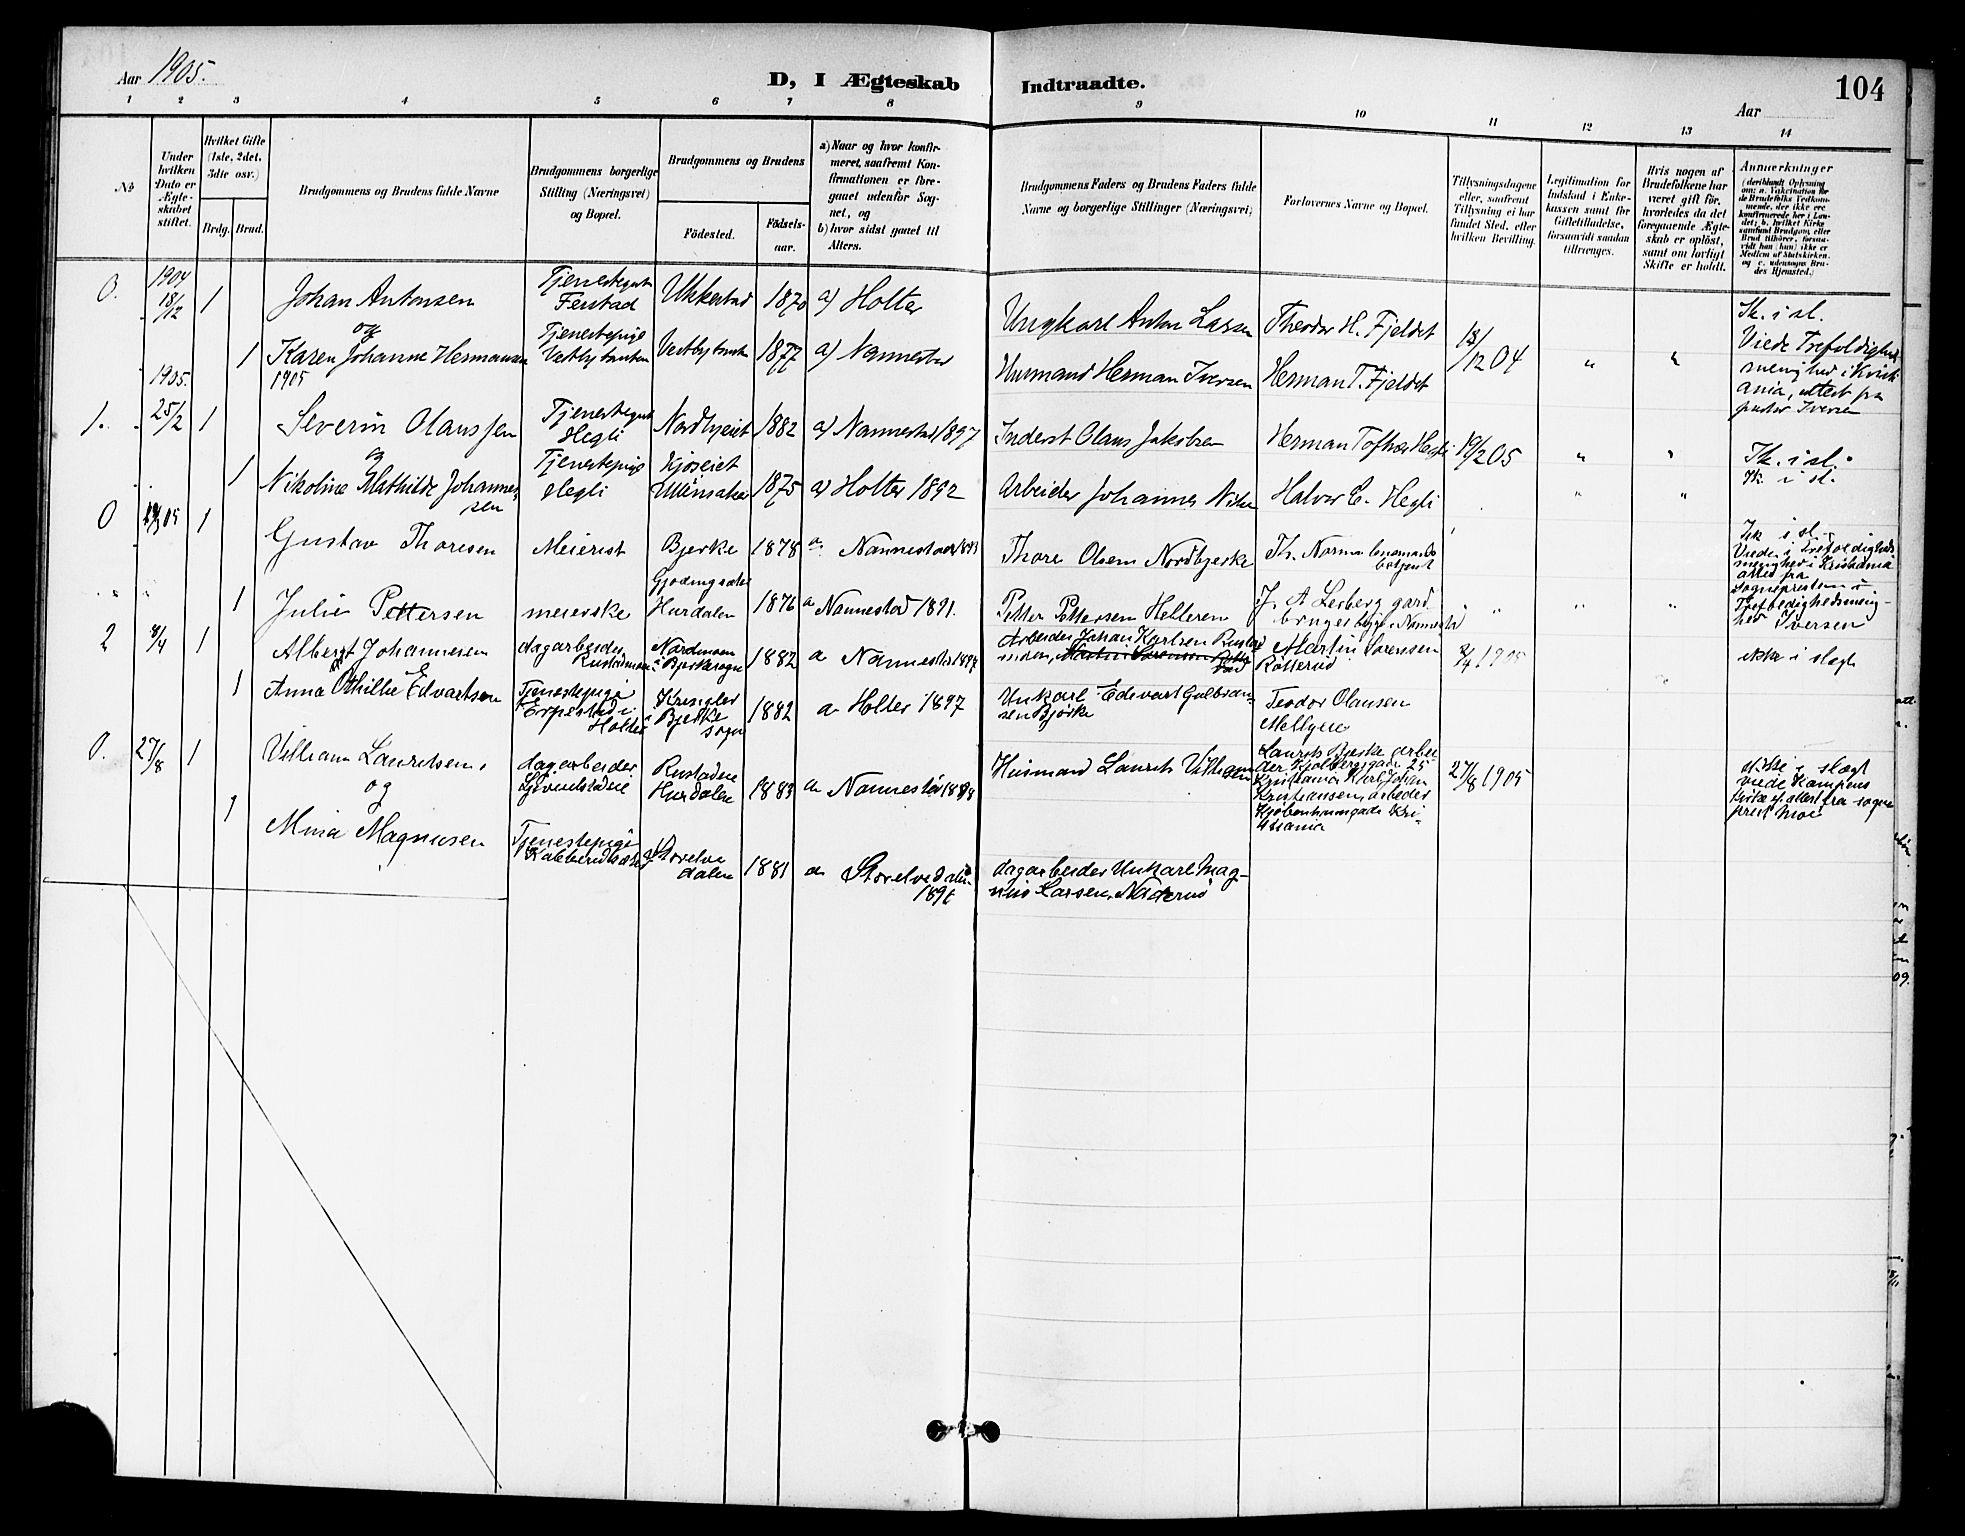 SAO, Nannestad prestekontor Kirkebøker, G/Ga/L0002: Klokkerbok nr. I 2, 1901-1913, s. 104